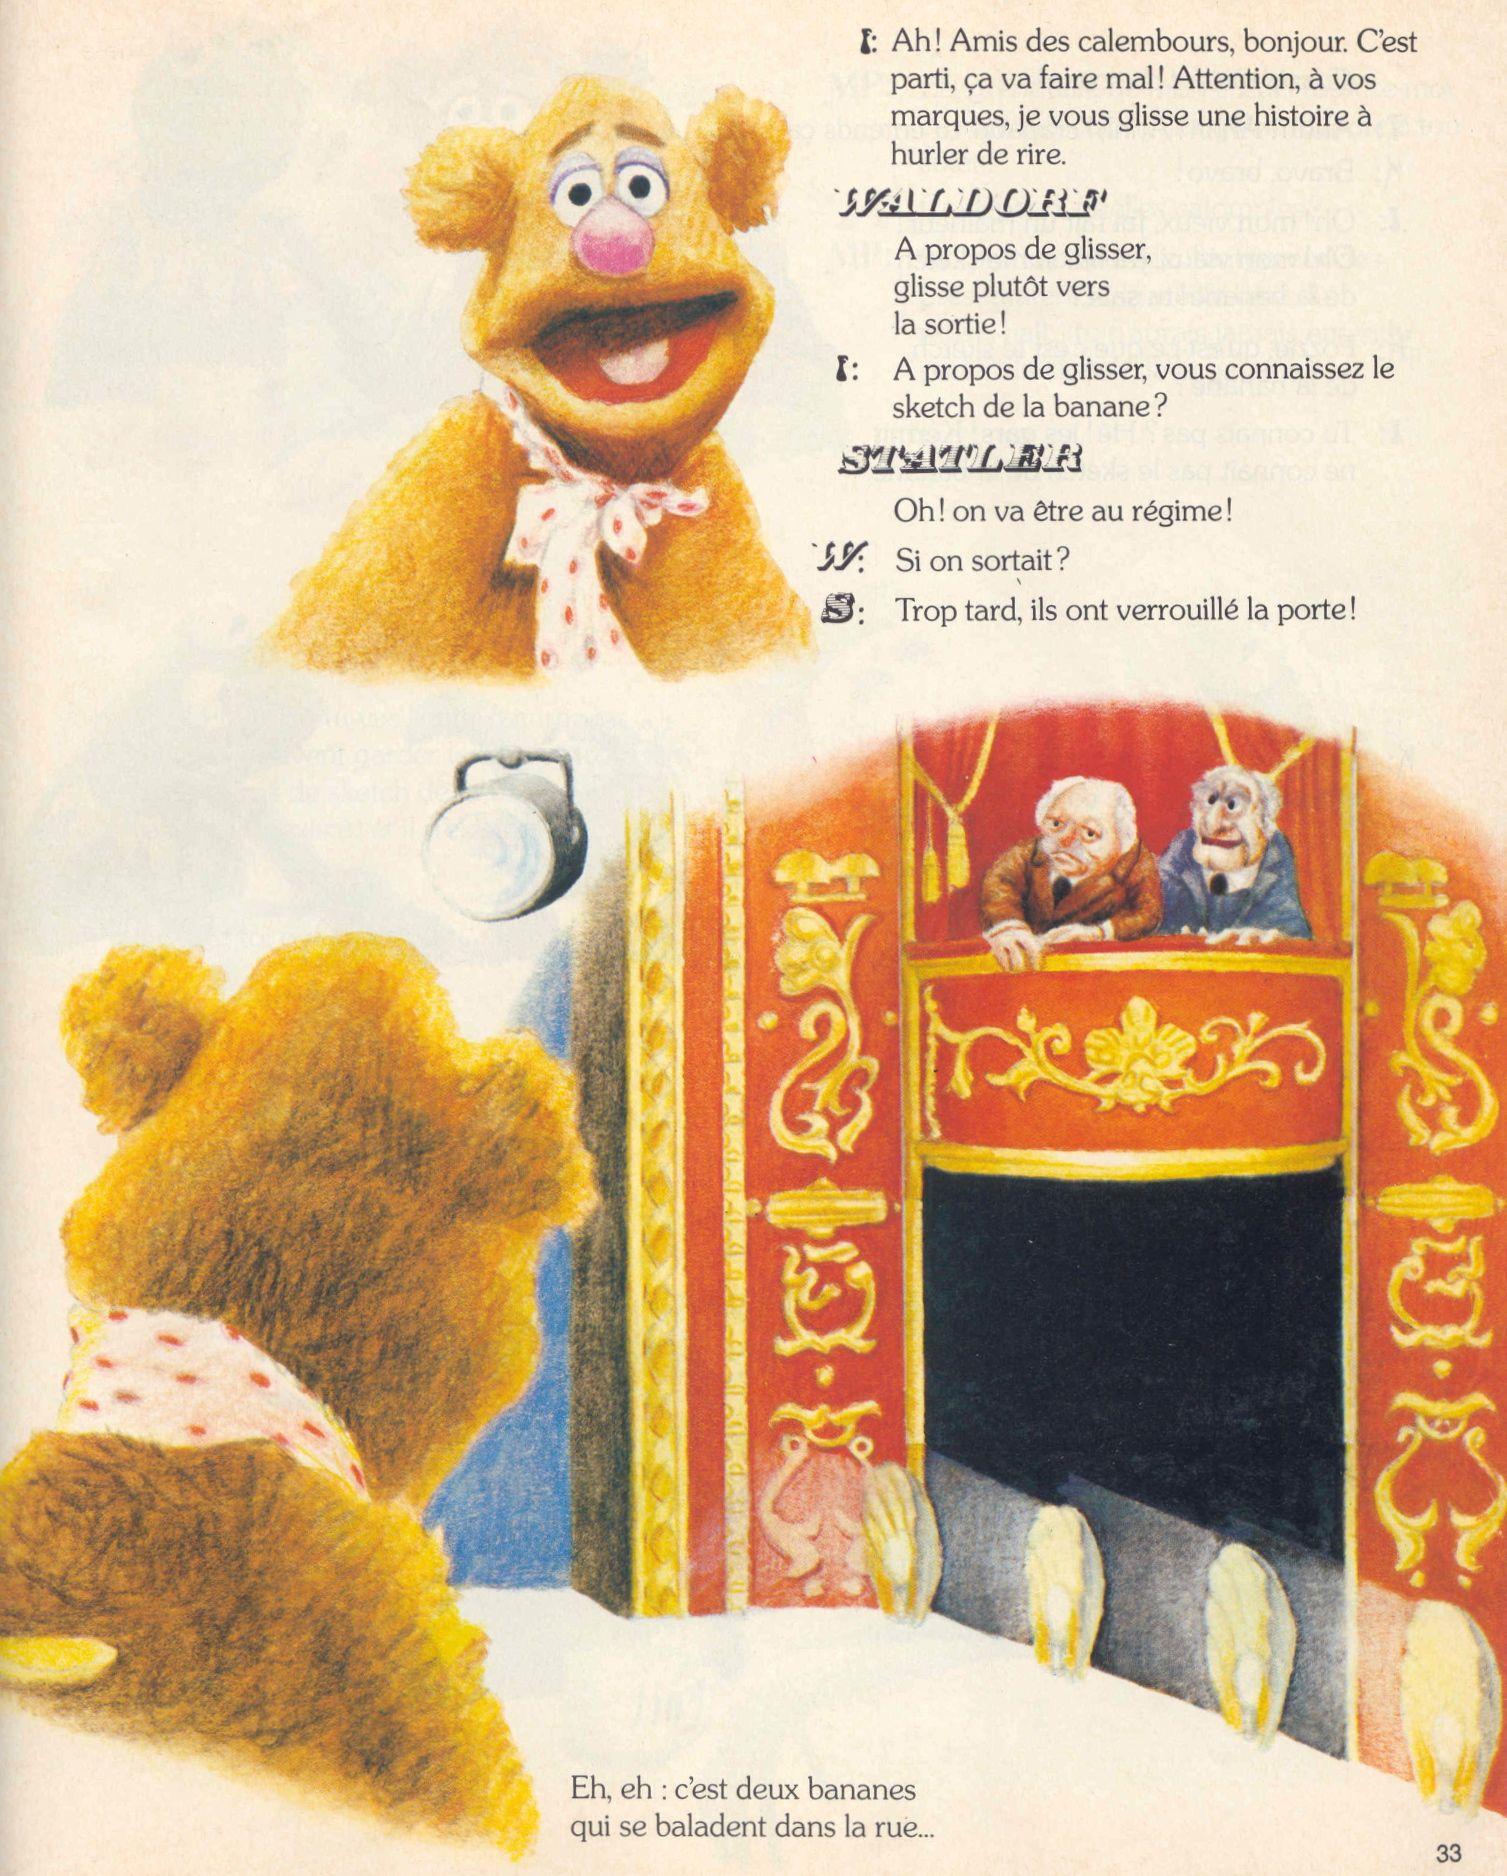 http://grenierdelatv.free.fr/2/muppetPif512janv197903.jpg